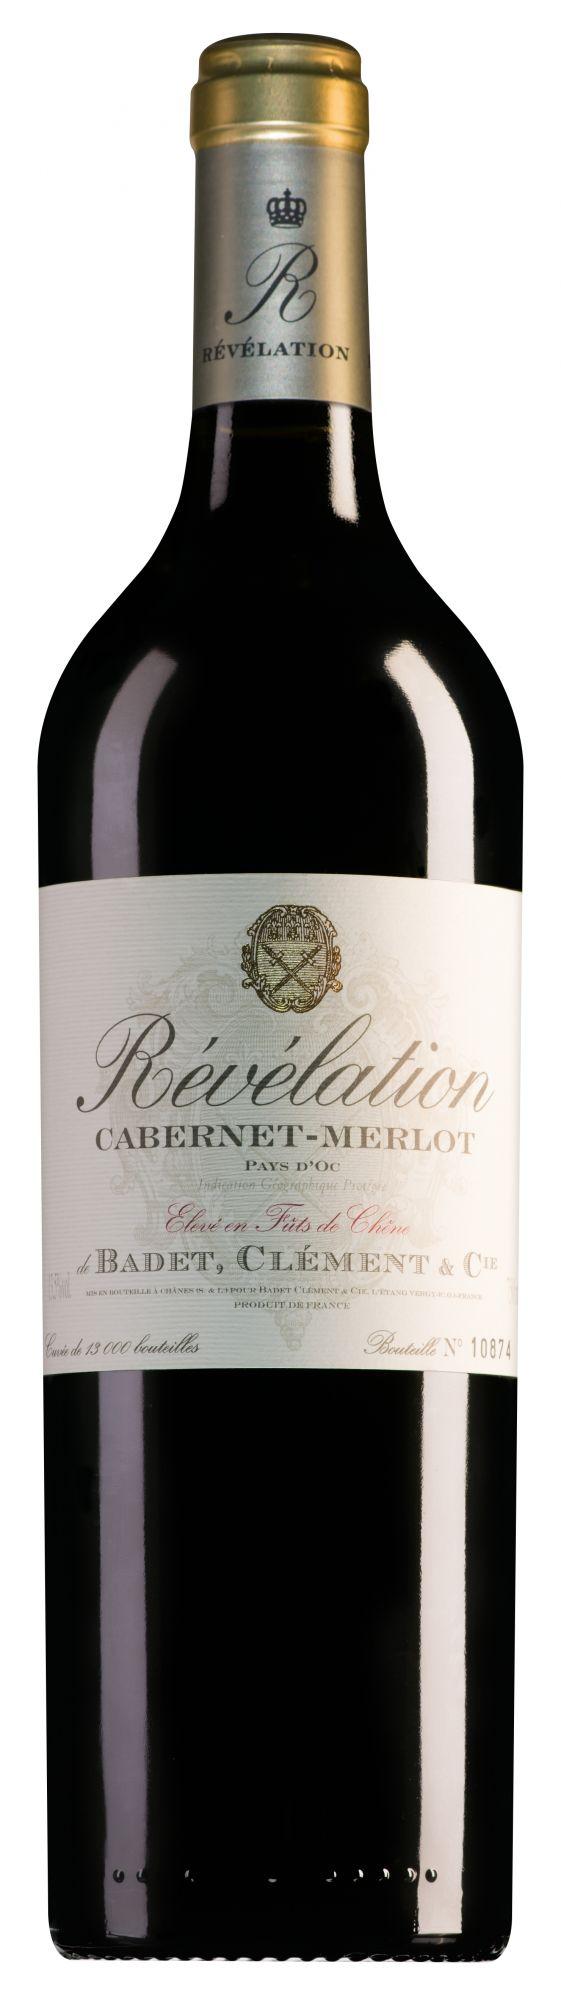 Révélation Pays d'Oc Cabernet-Merlot